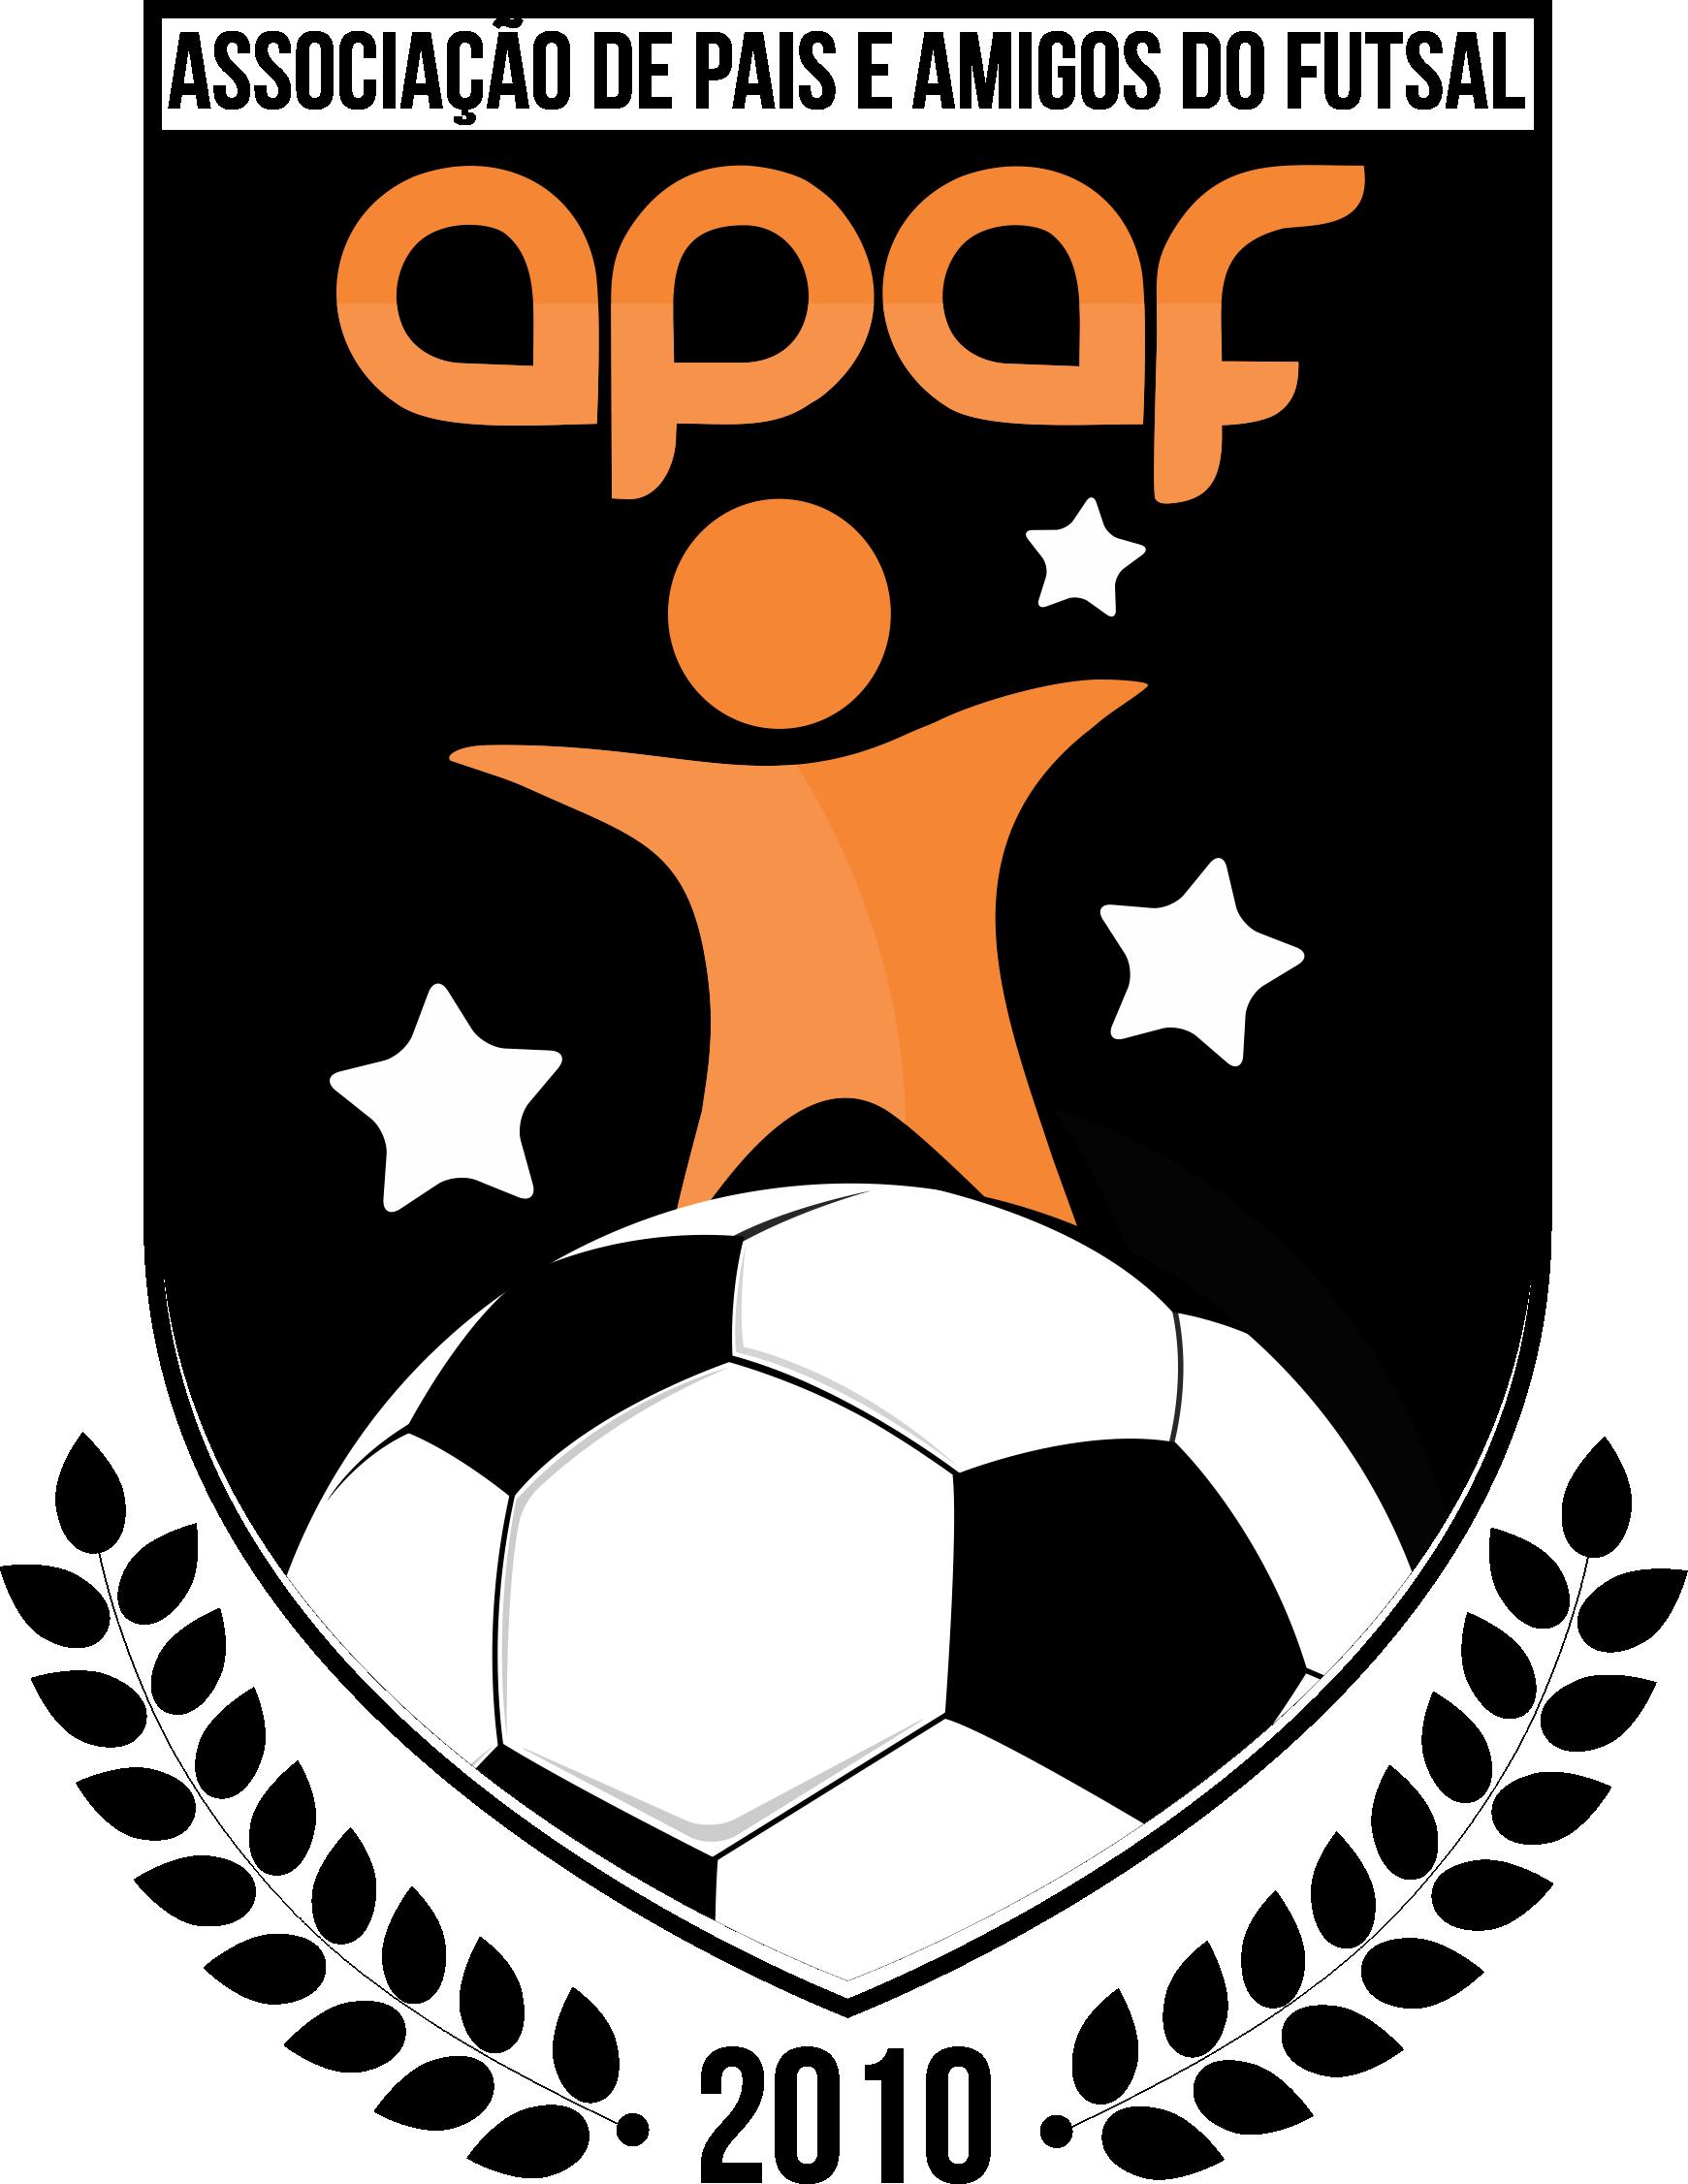 Apaf Futsal/Sespor/Semedi